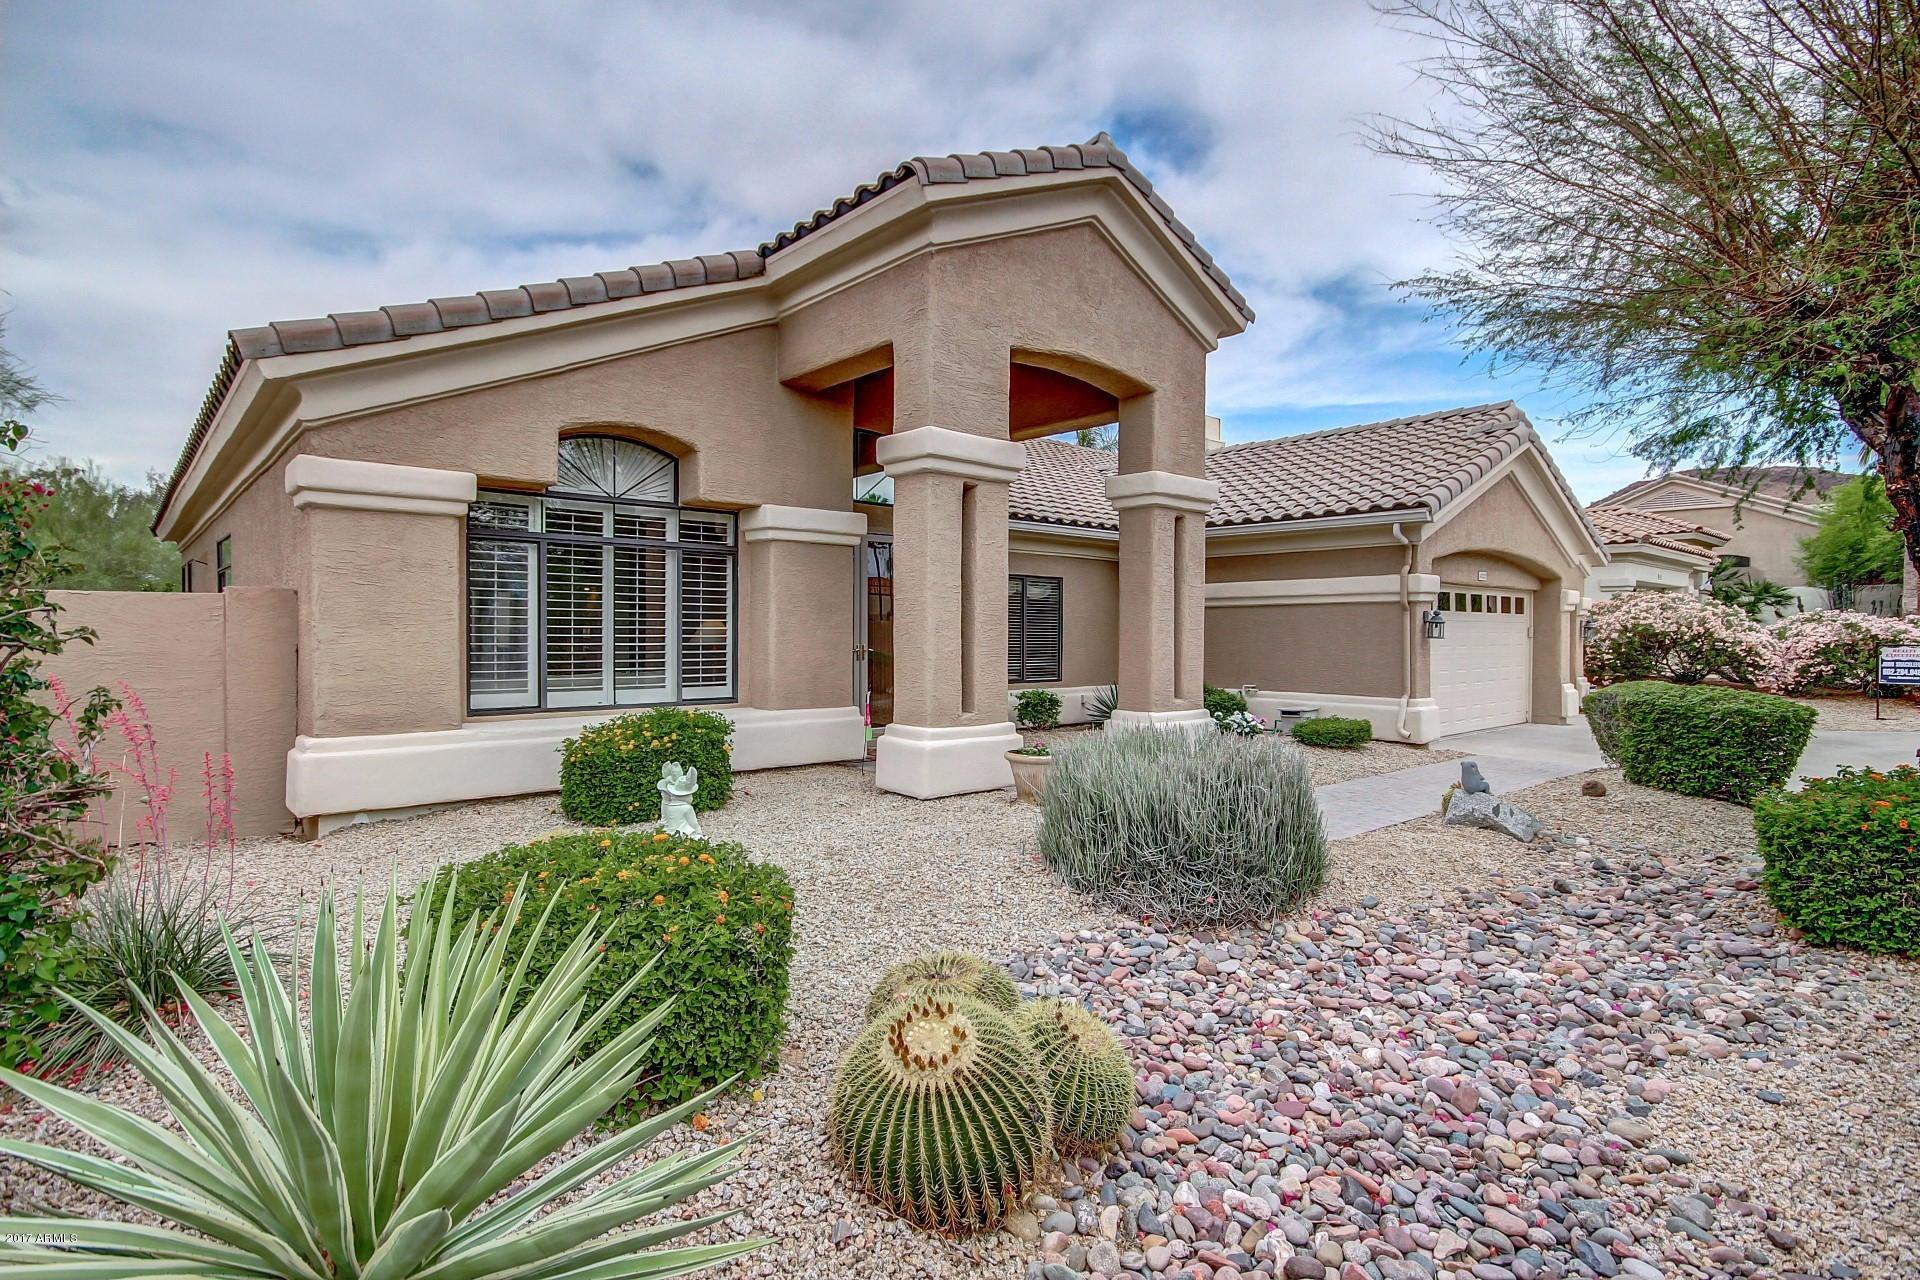 14202 N 14TH Street Phoenix, AZ 85022 - MLS #: 5597982